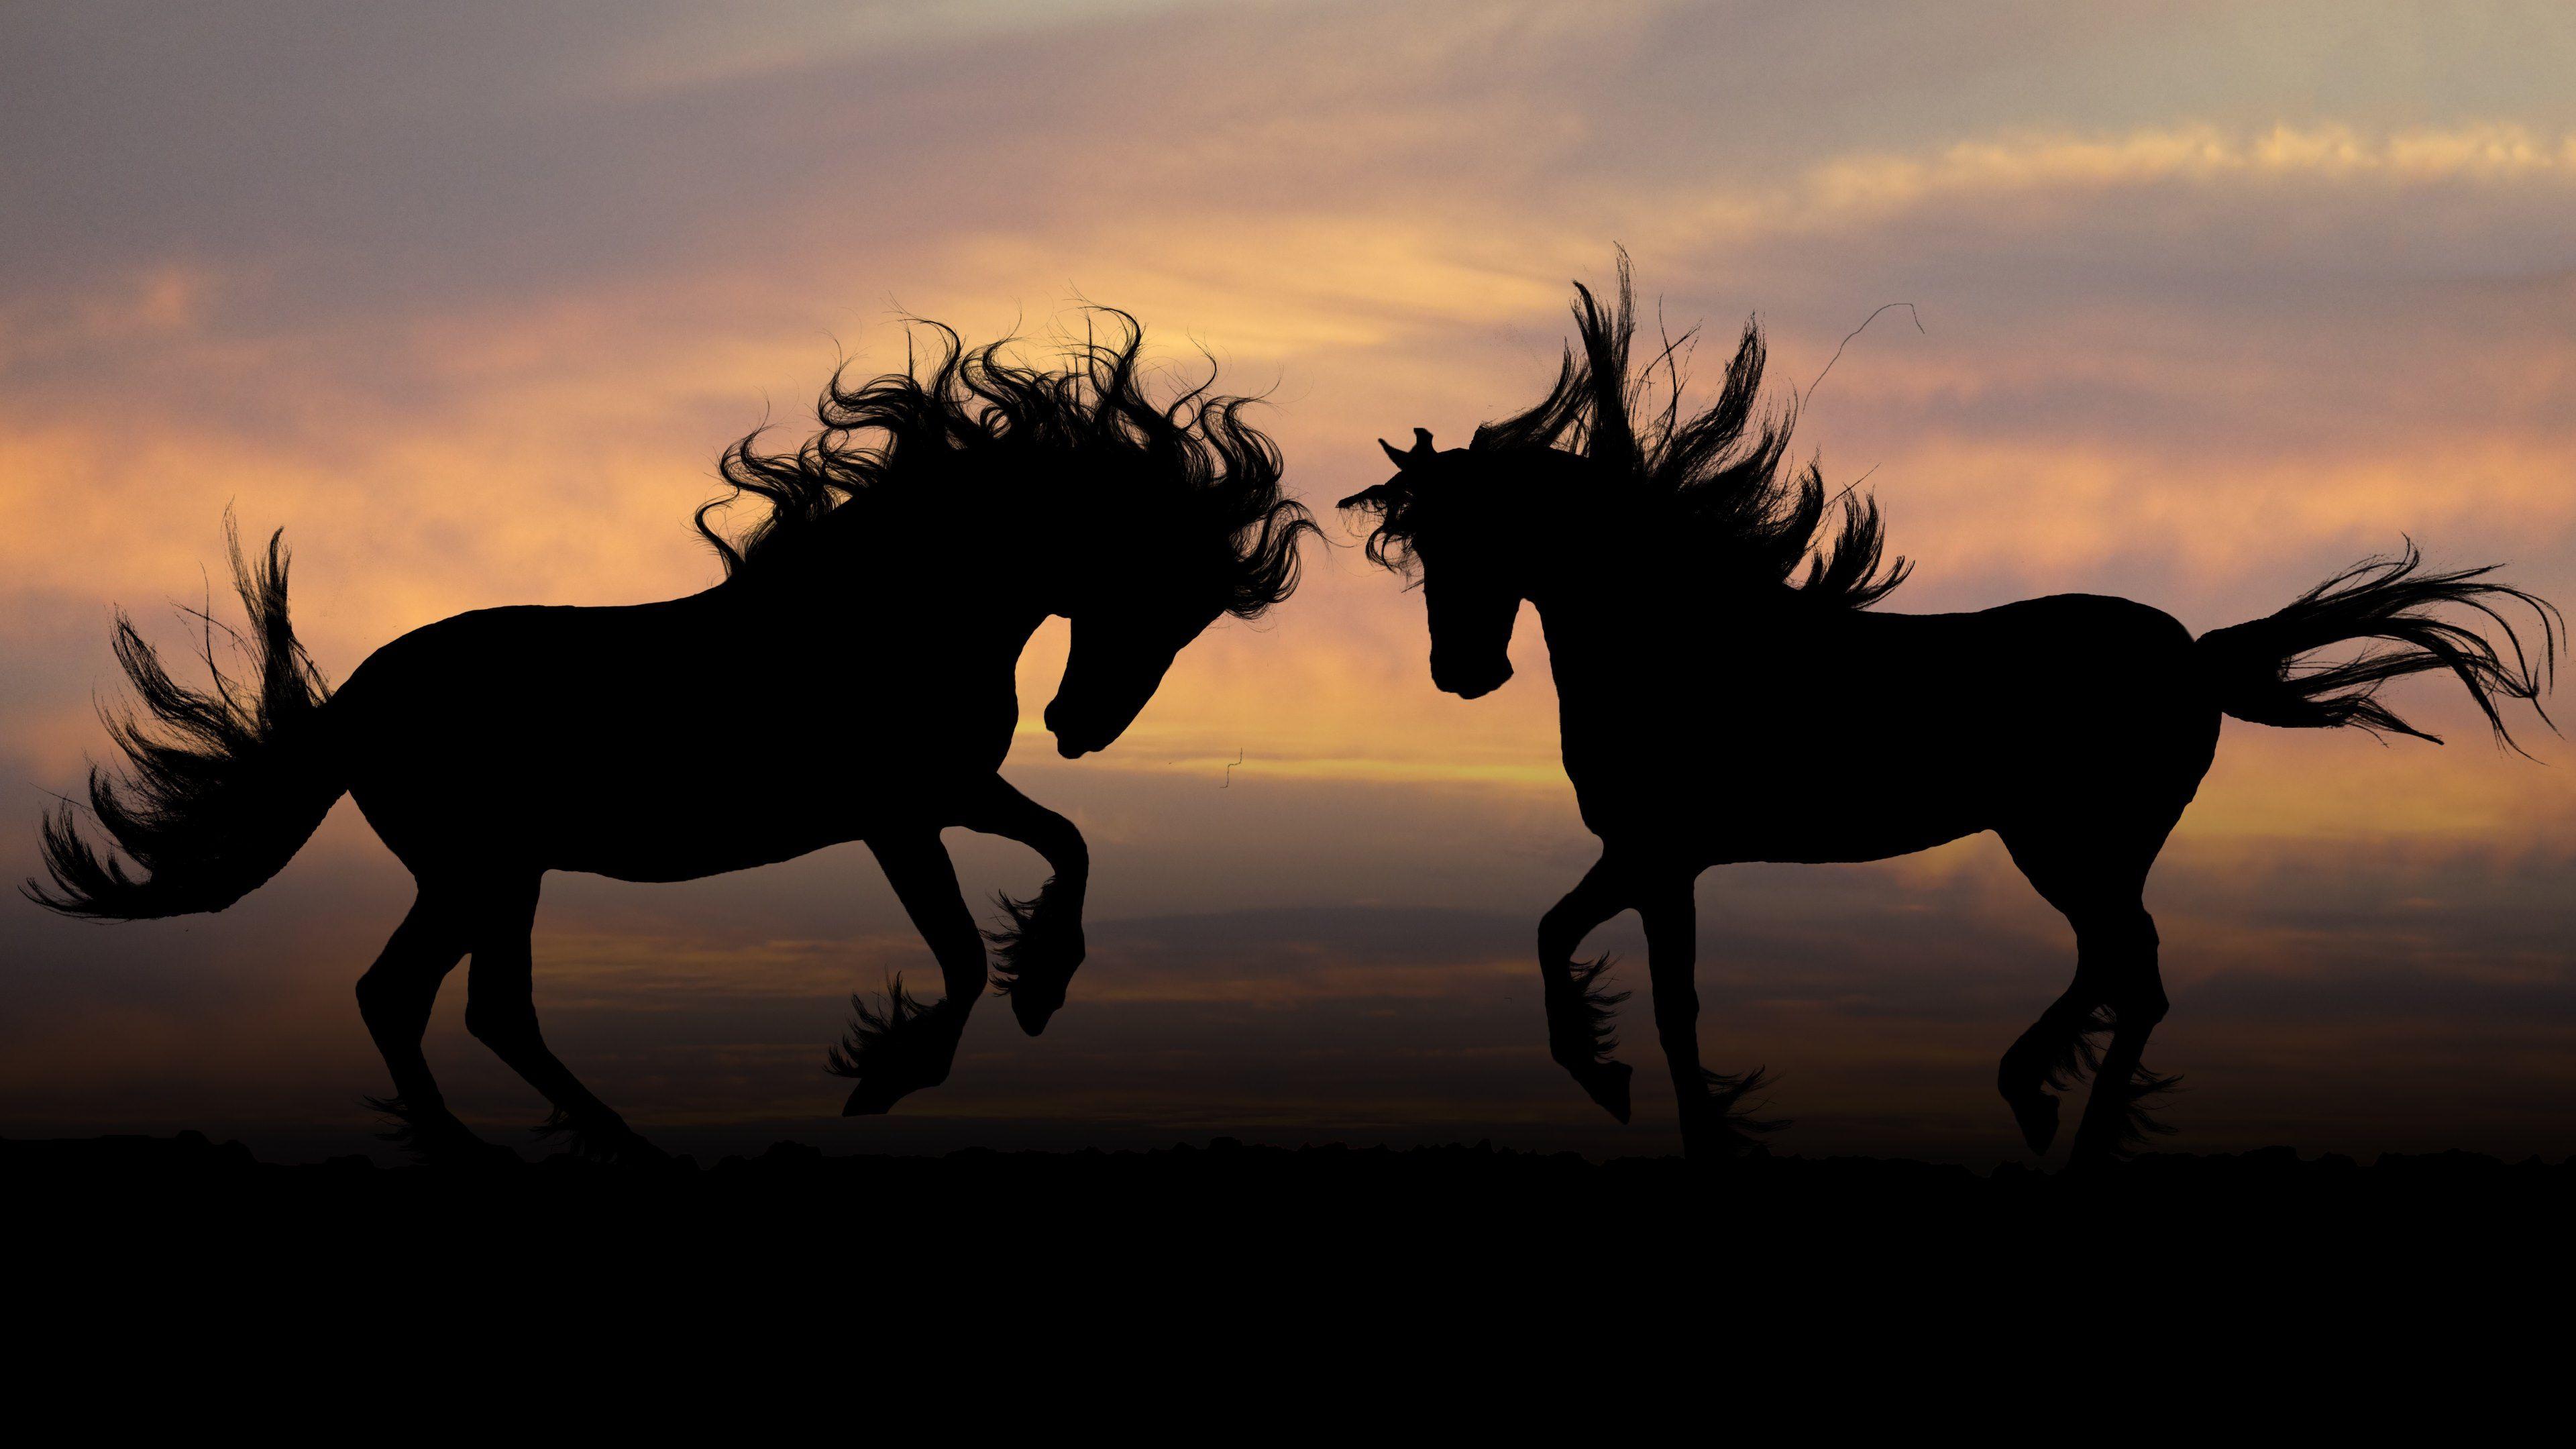 Horse 4K Ultra HD Wallpaper Horse Silhouettes HD Wallpapers 4K 3840x2160